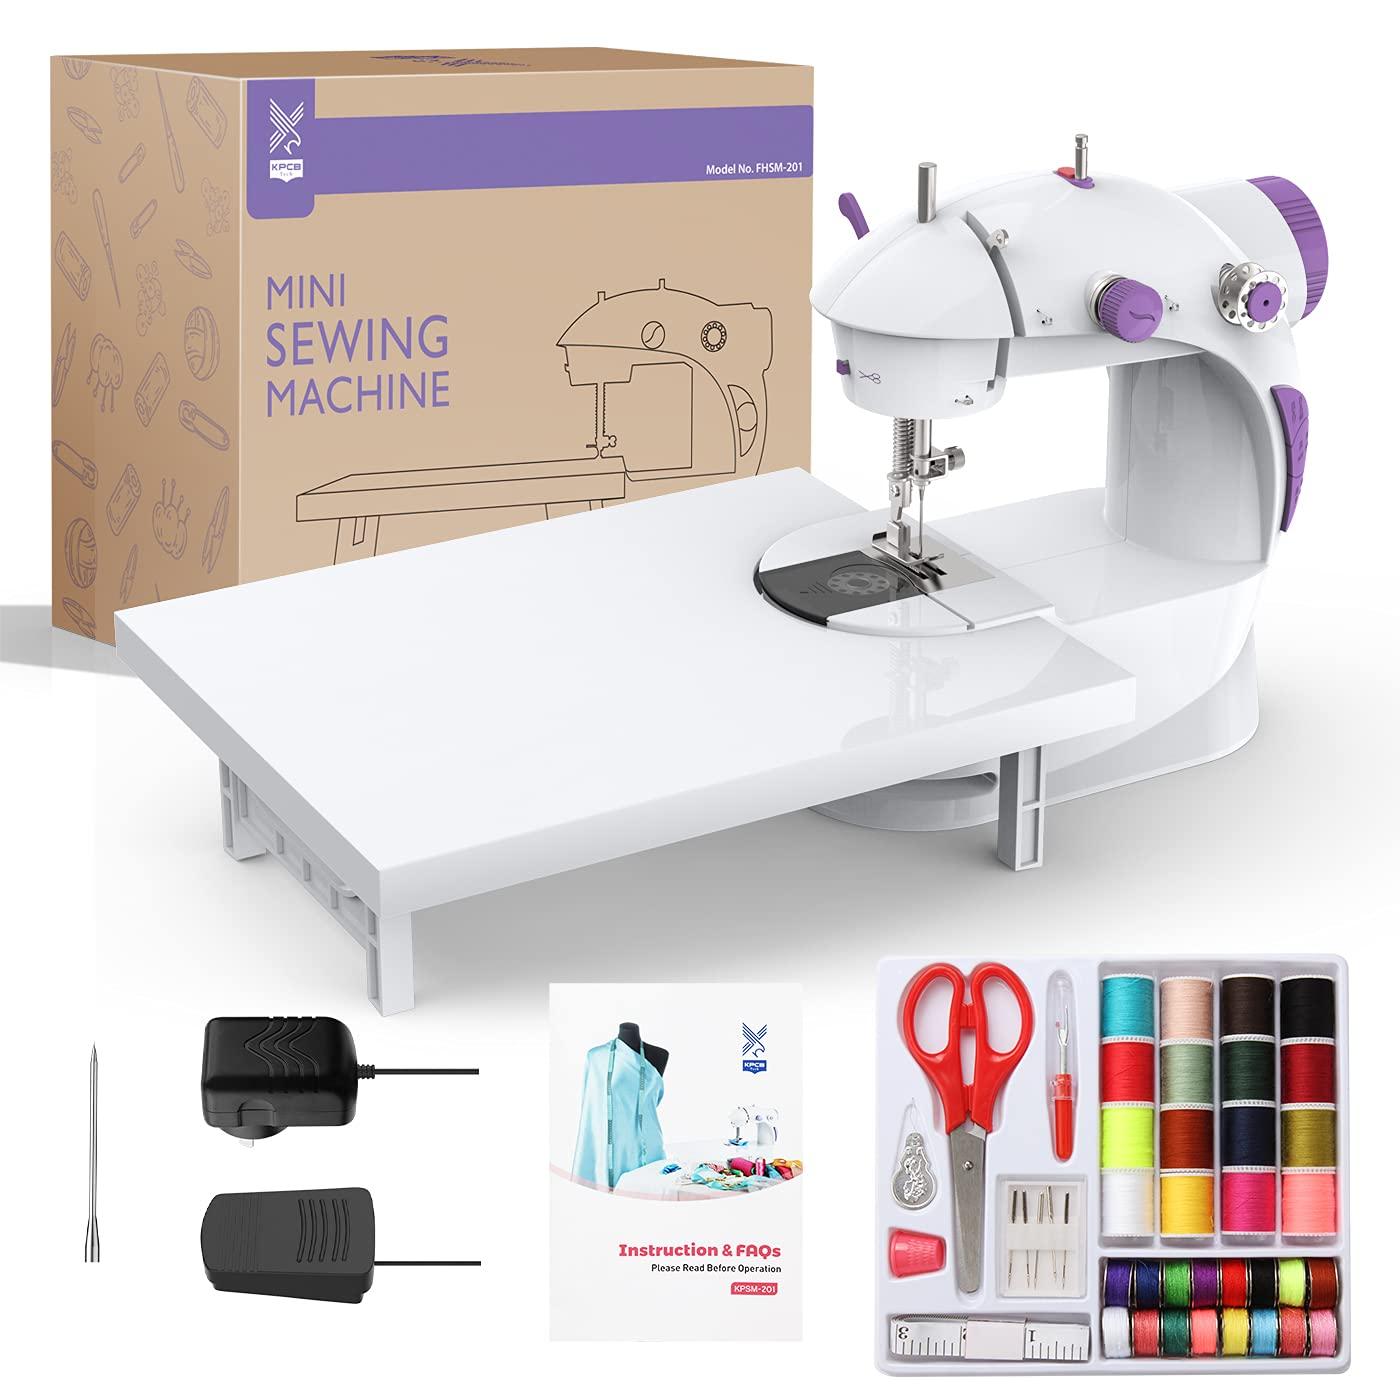 KPCB Tech Mini Sewing Machine